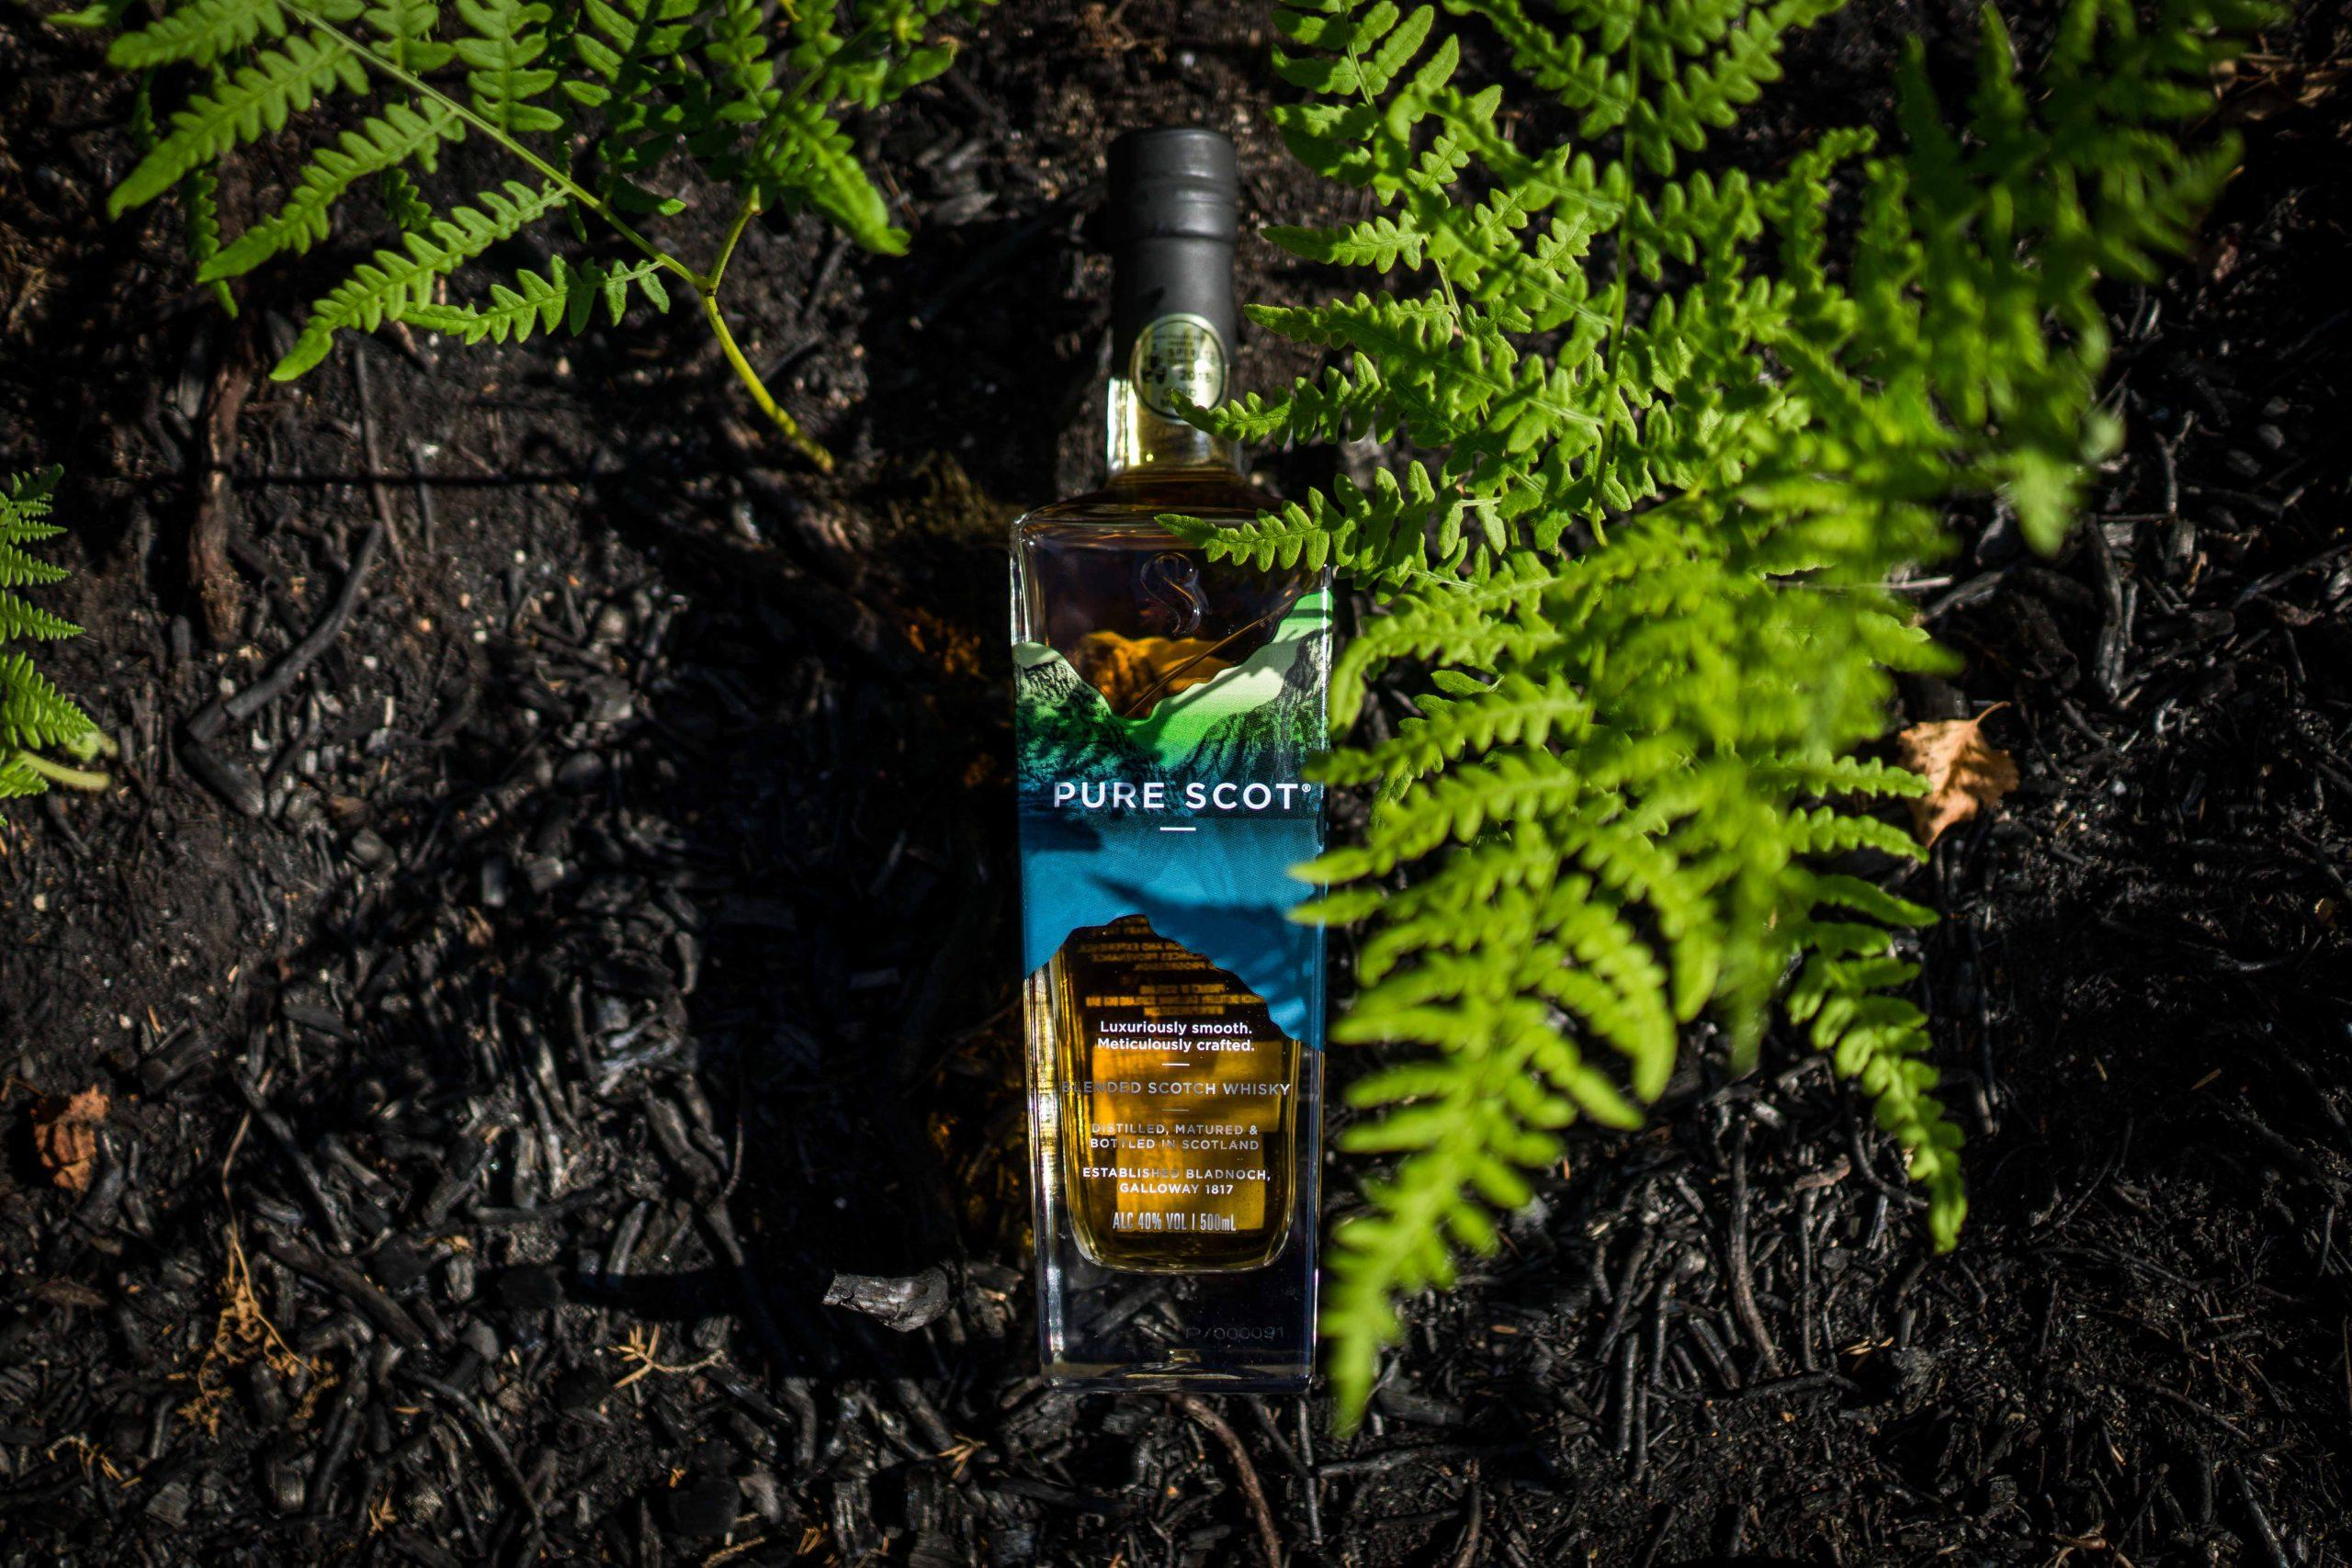 Pure Scot by Bladnoch